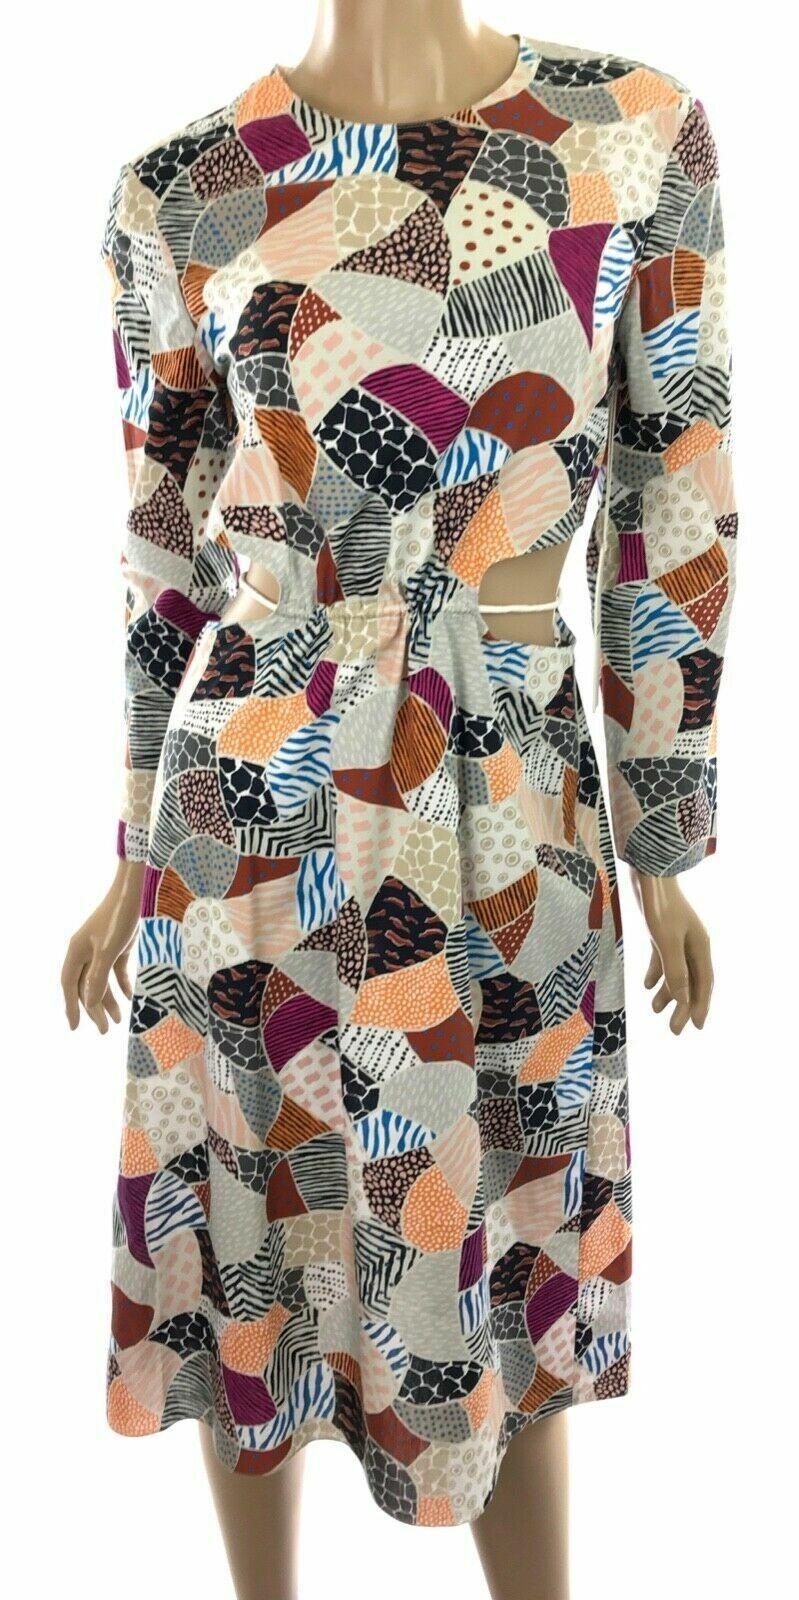 Edun New Dress Ecru Multi-Farbe Broken Tile Poplin Cotton Cut Outs at Waist